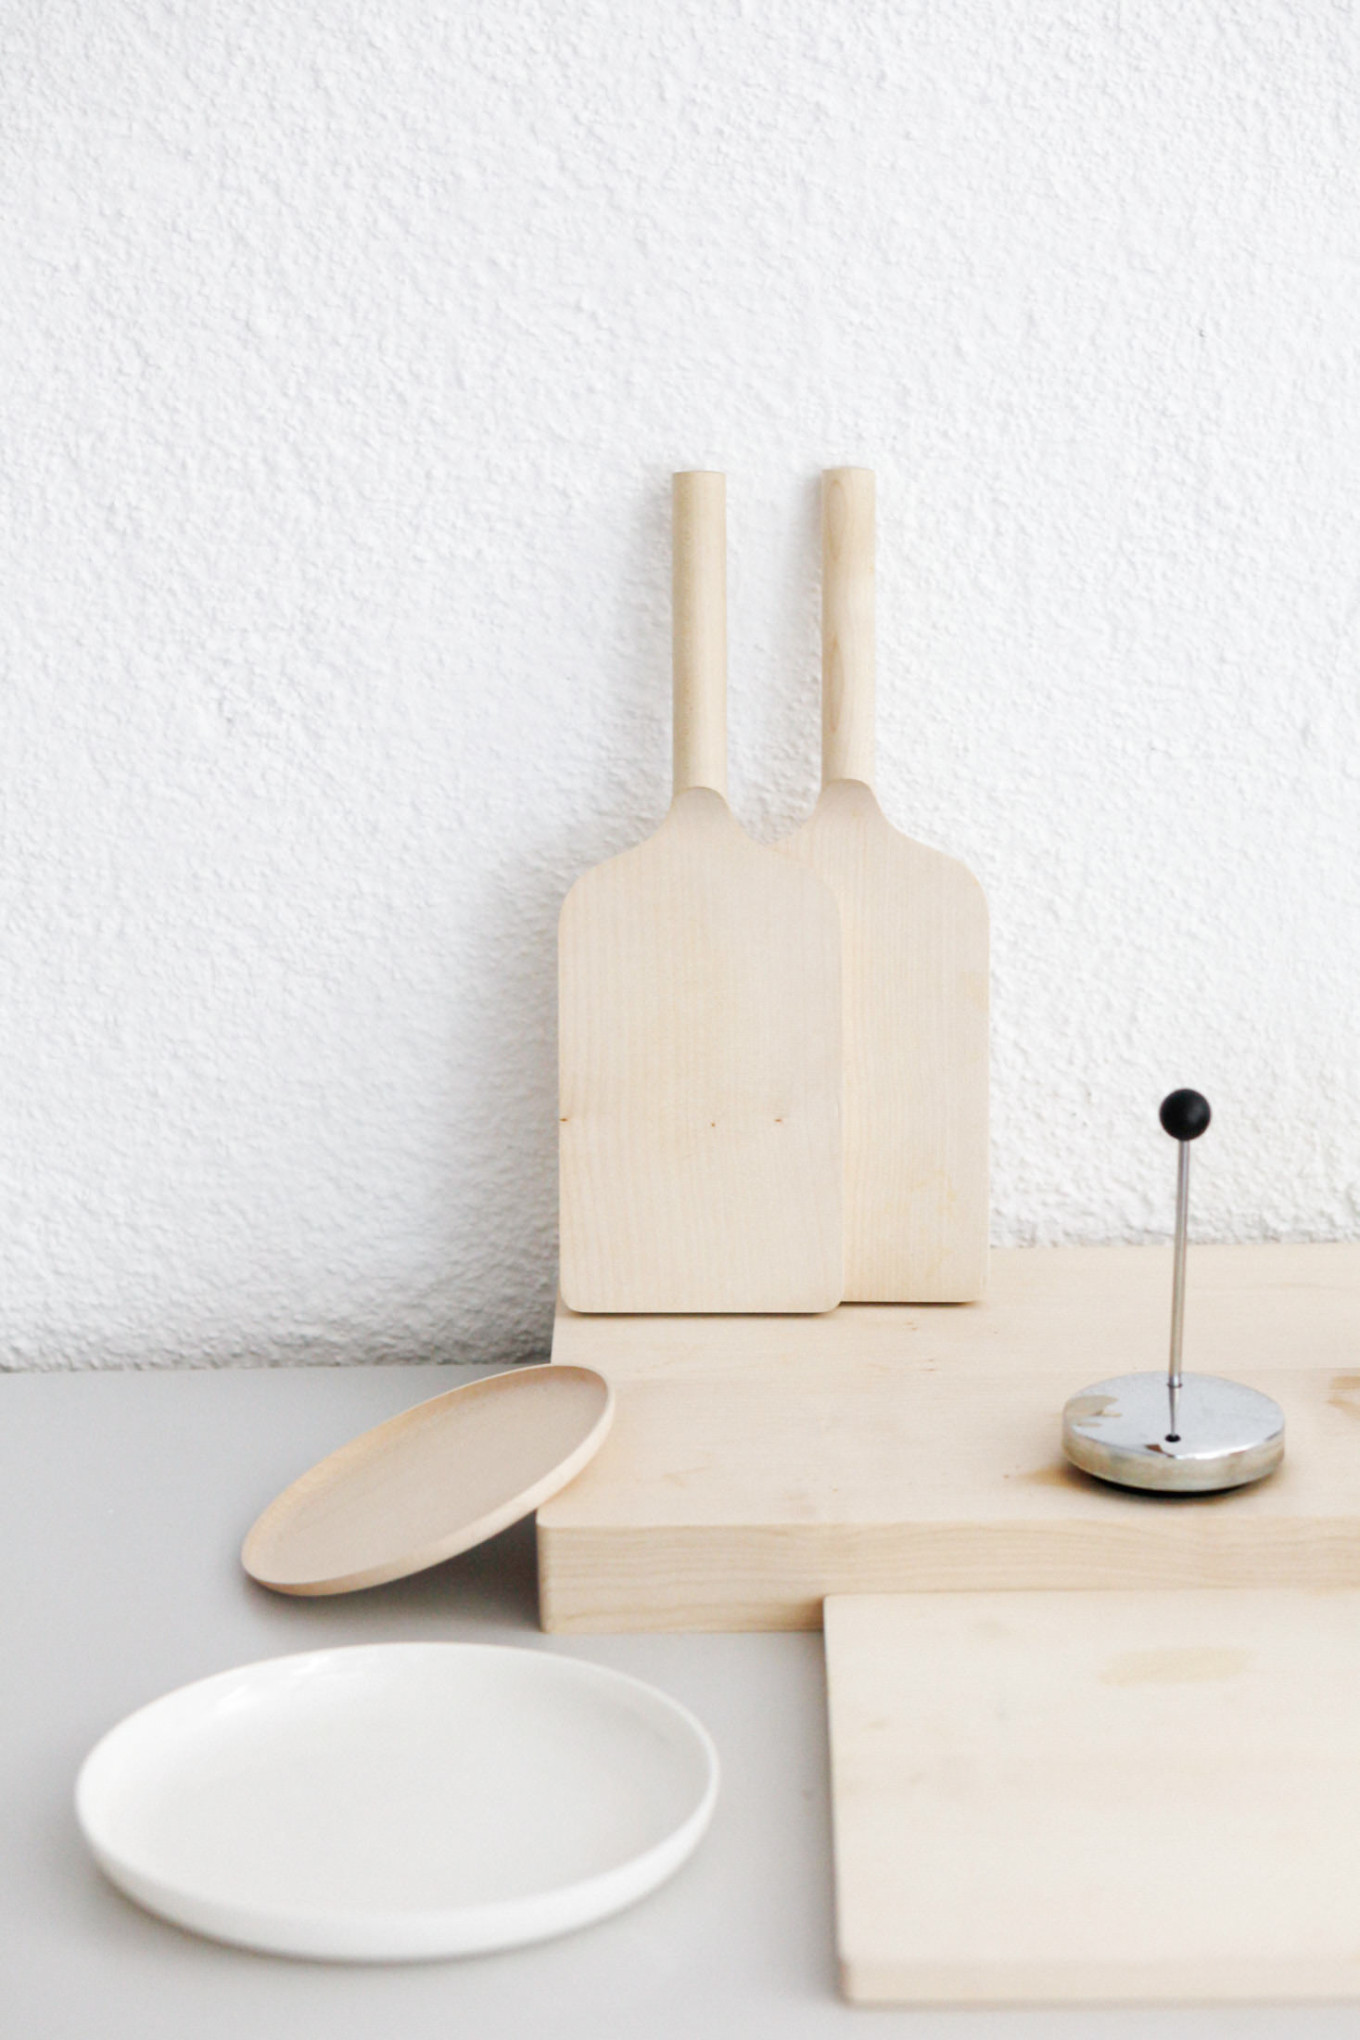 ysso-carlo-clopath-kueche-studio